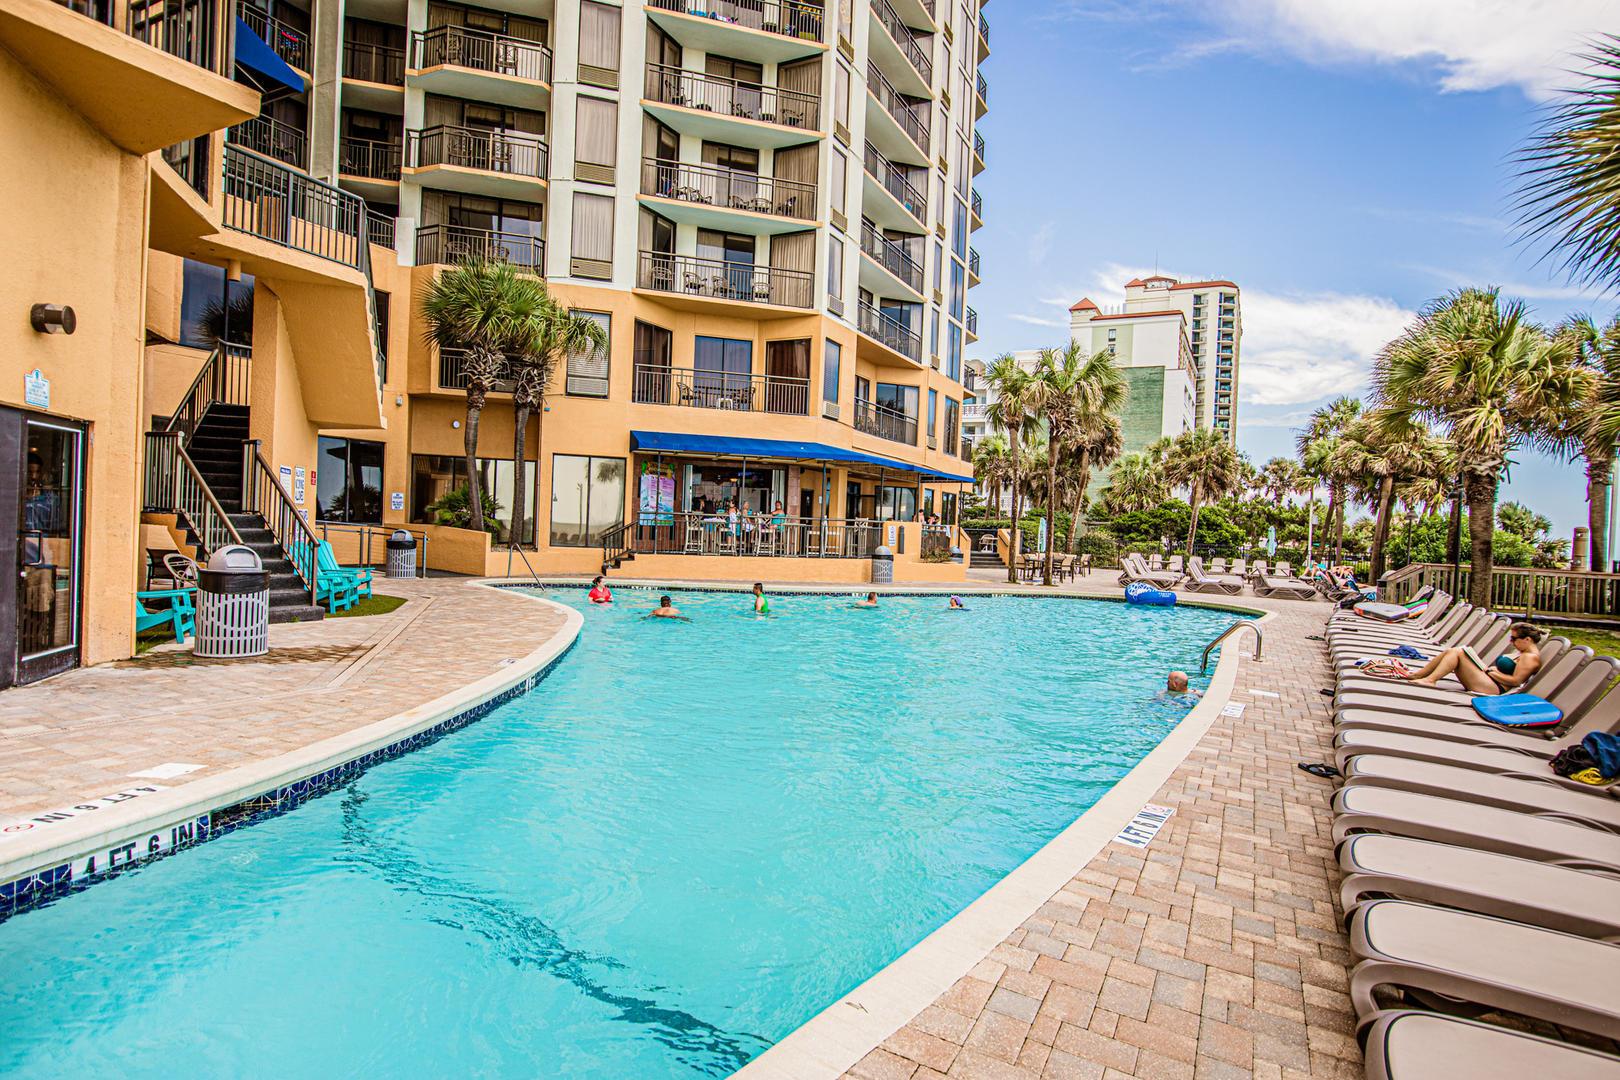 Patricia Grand Outdoor Pool (open seasonally)